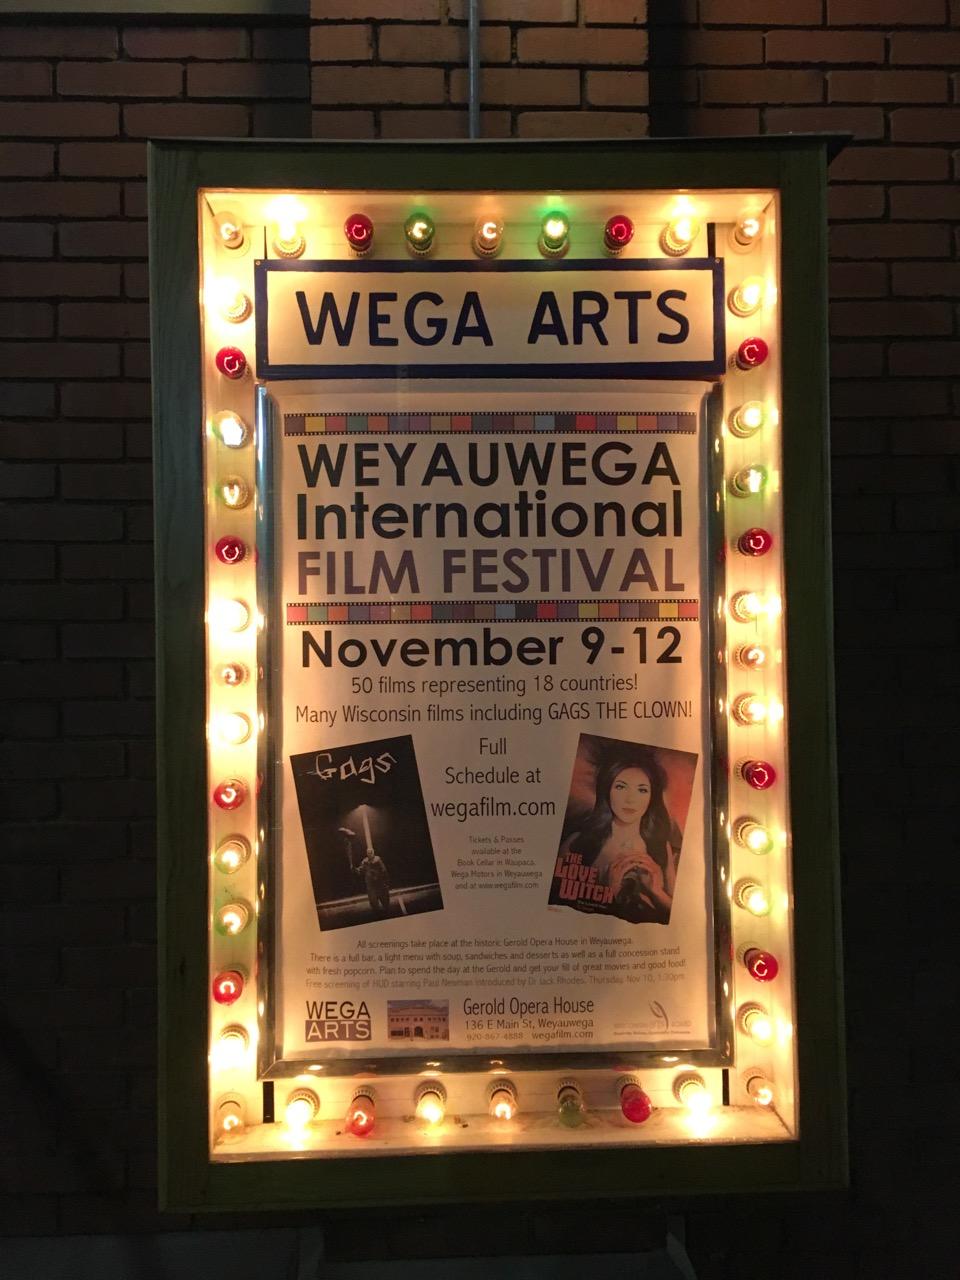 Weyauwega International Film Festival